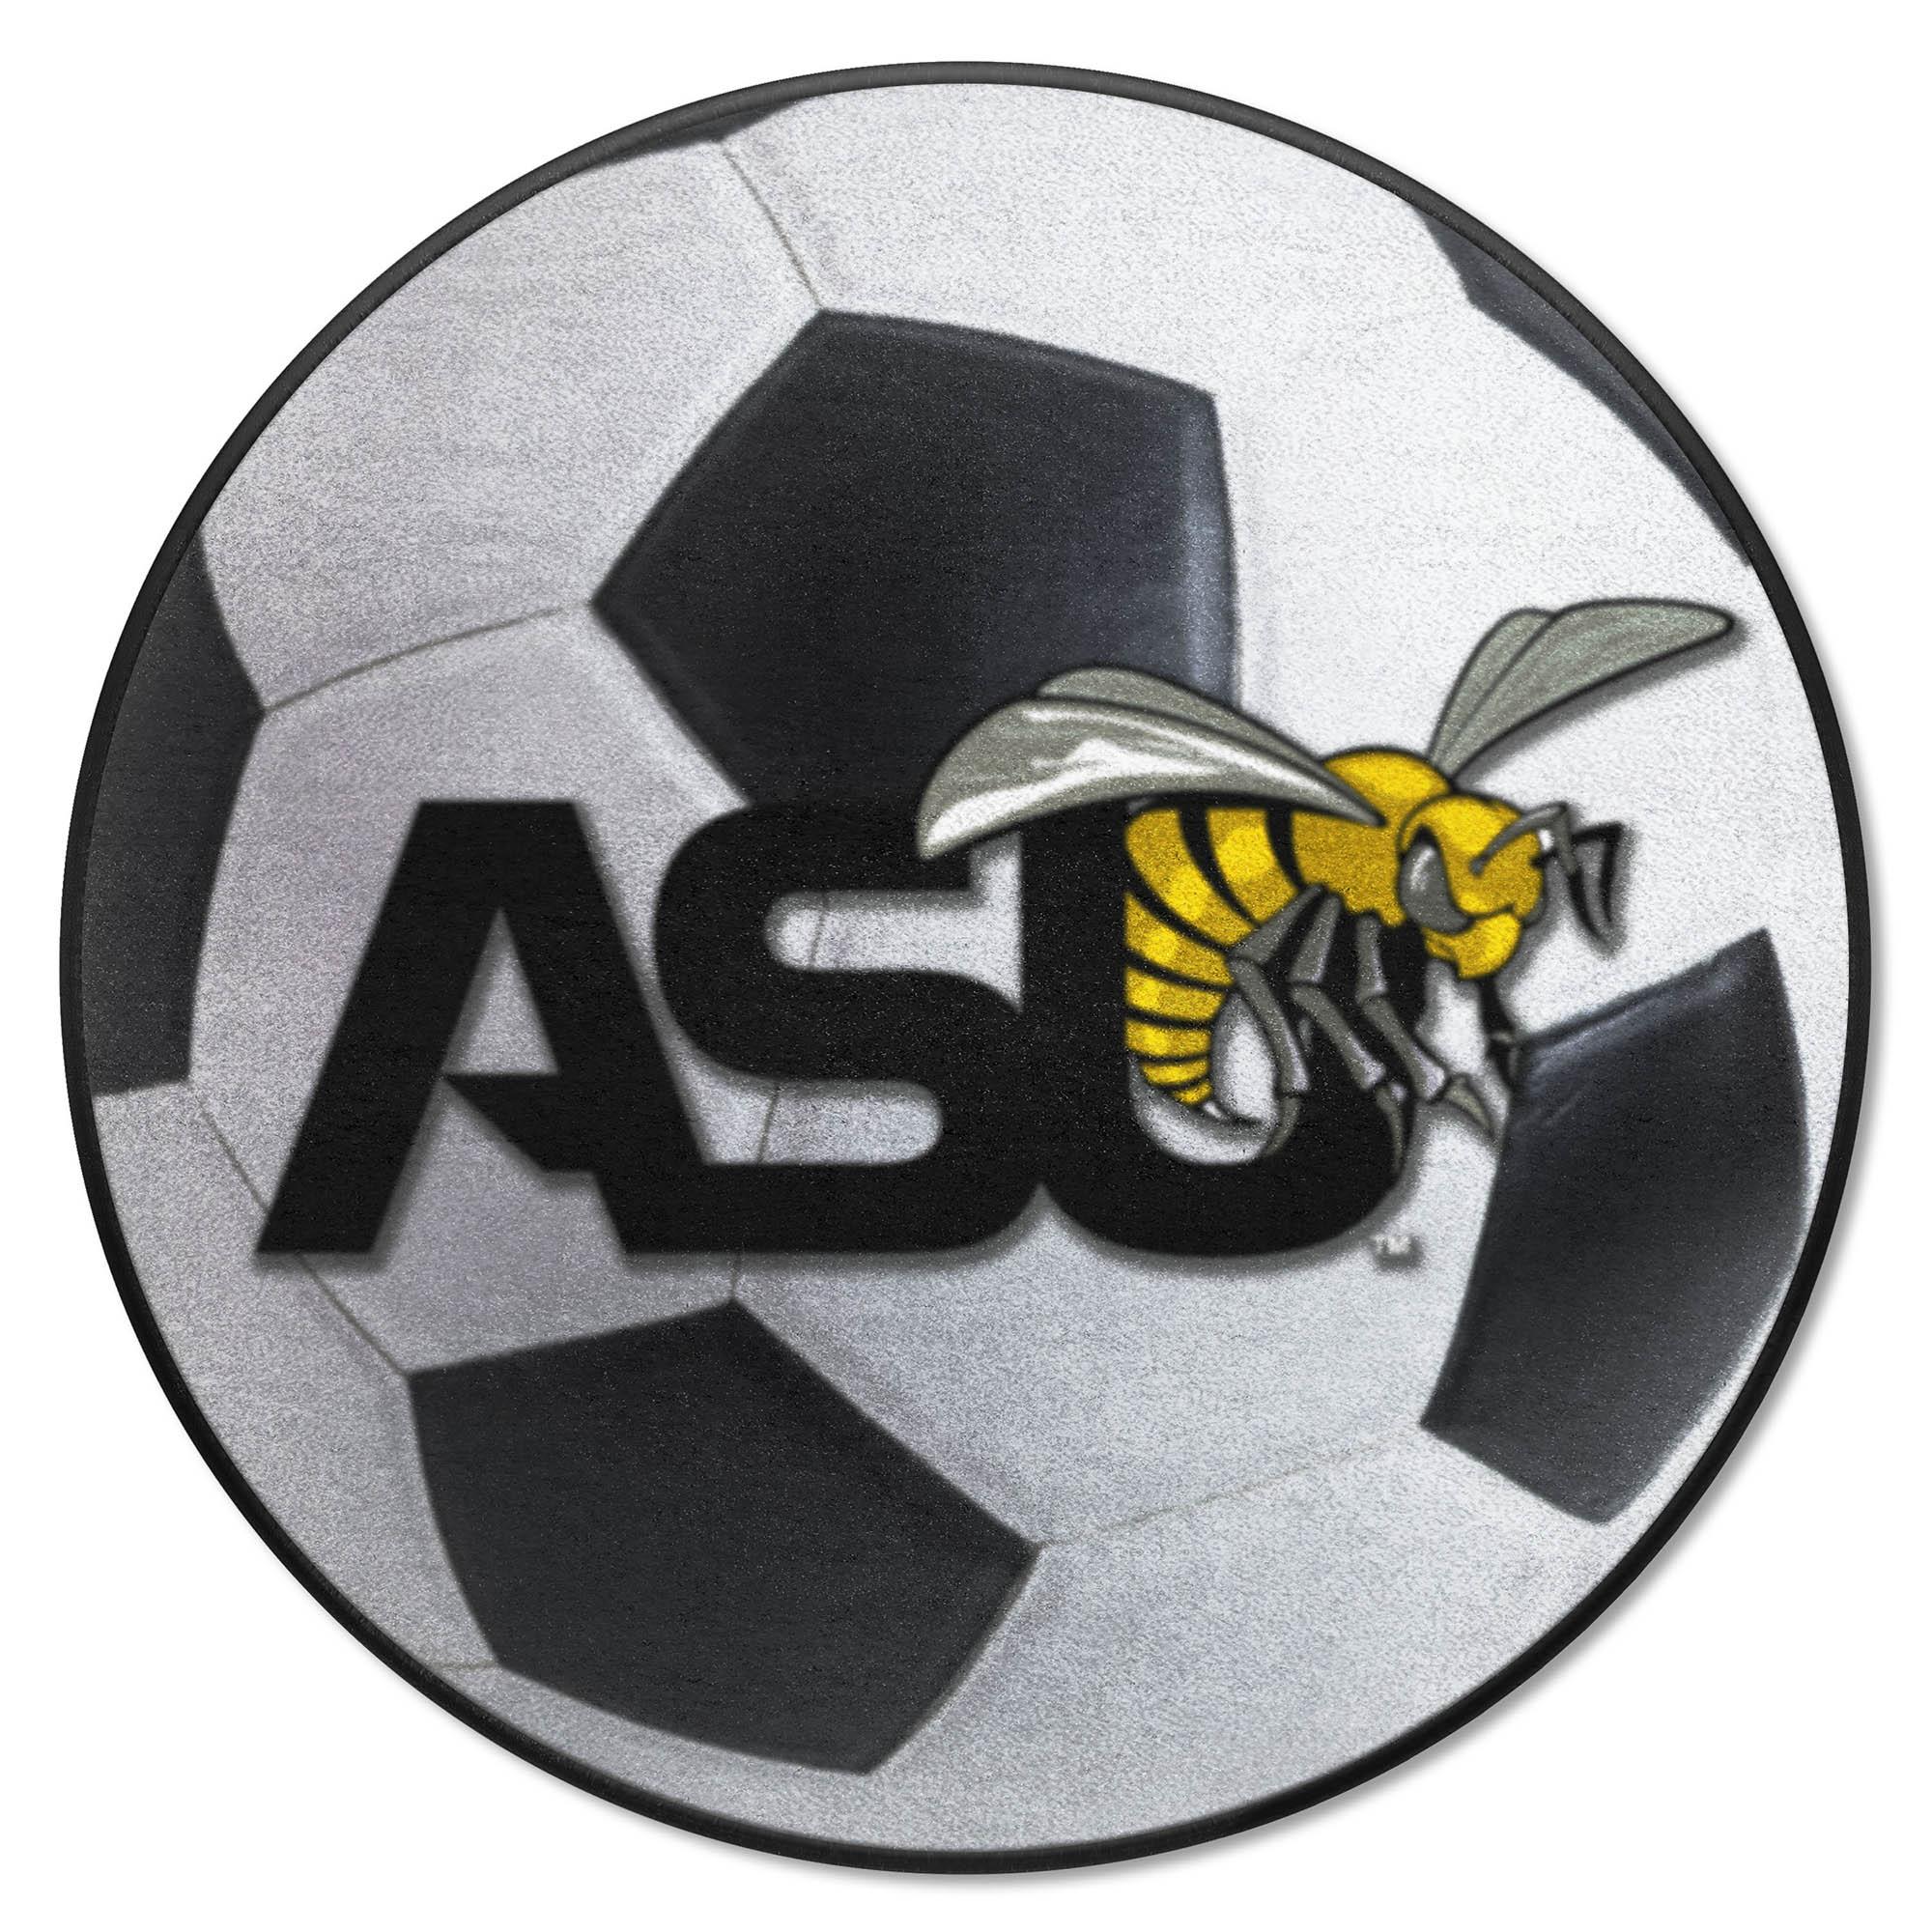 Fanmats Alabama State University Sports Team Logo Nylon Carpet Soccer Ball Shaped Indoor Home Decor Floor Area Rug